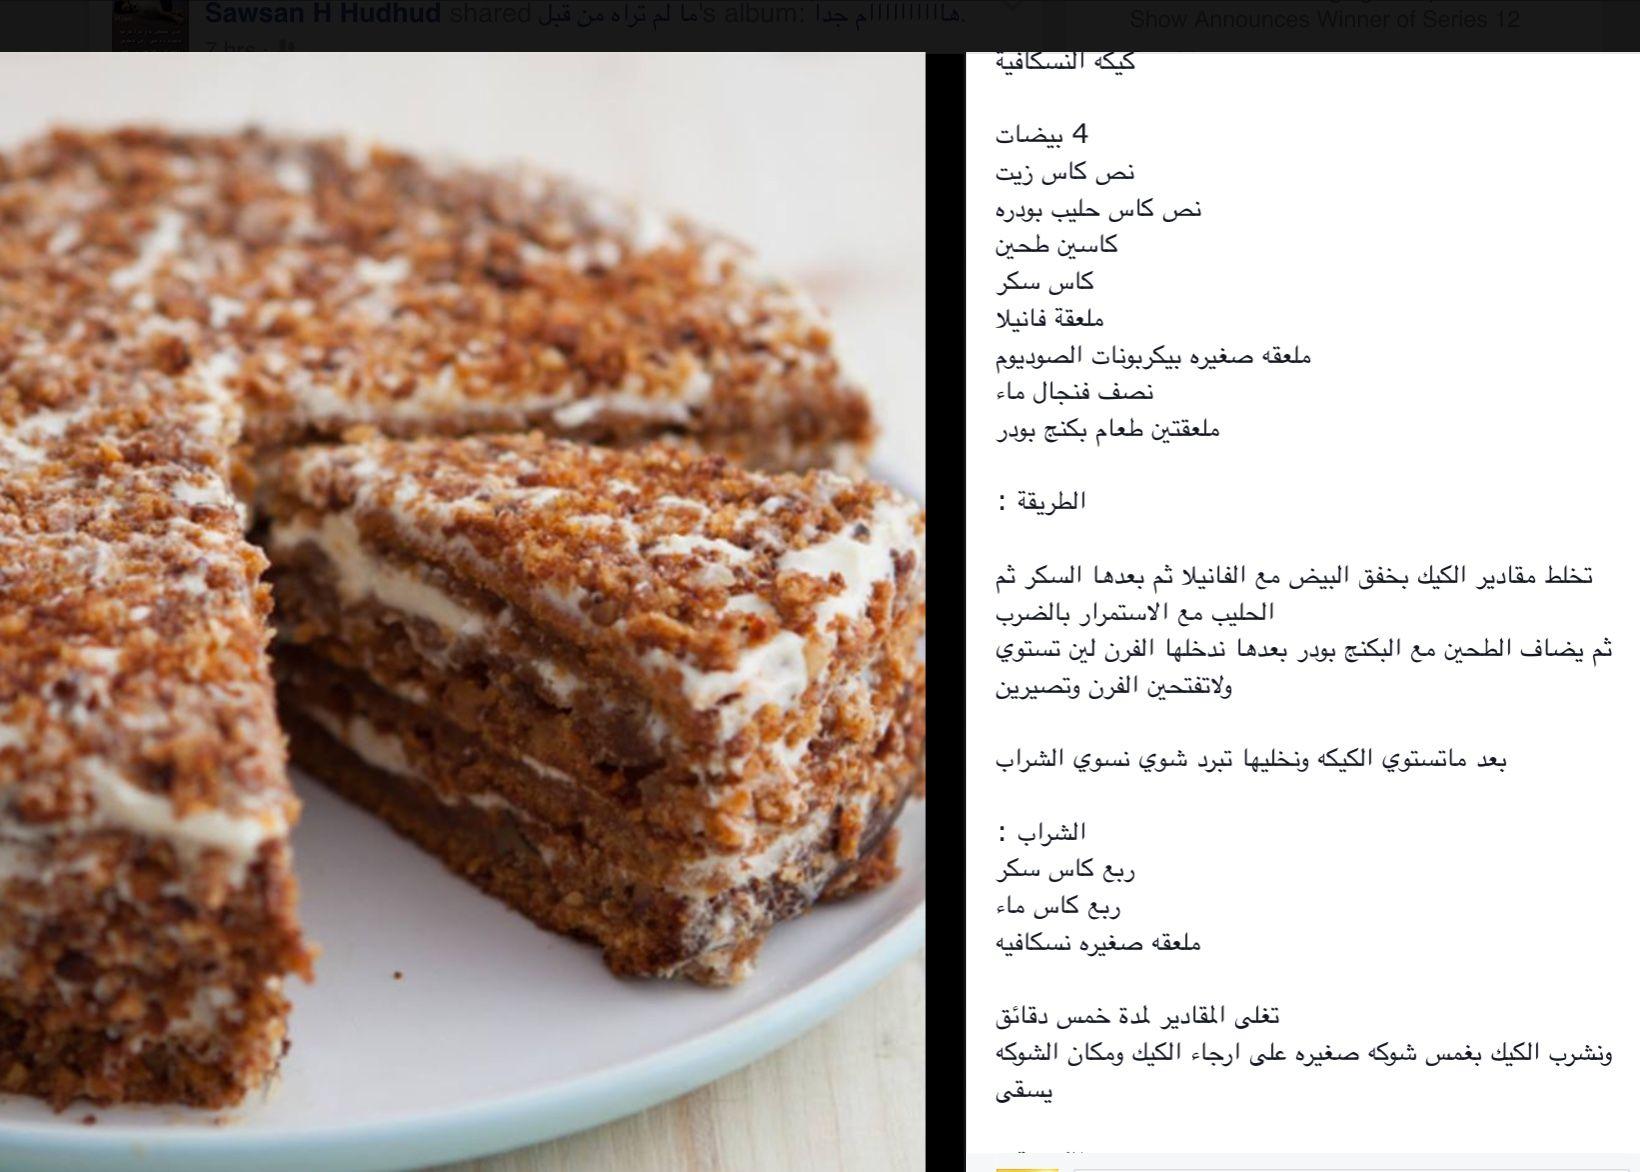 Nescafe Cake 1 2 Dessert Recipes Desserts Food